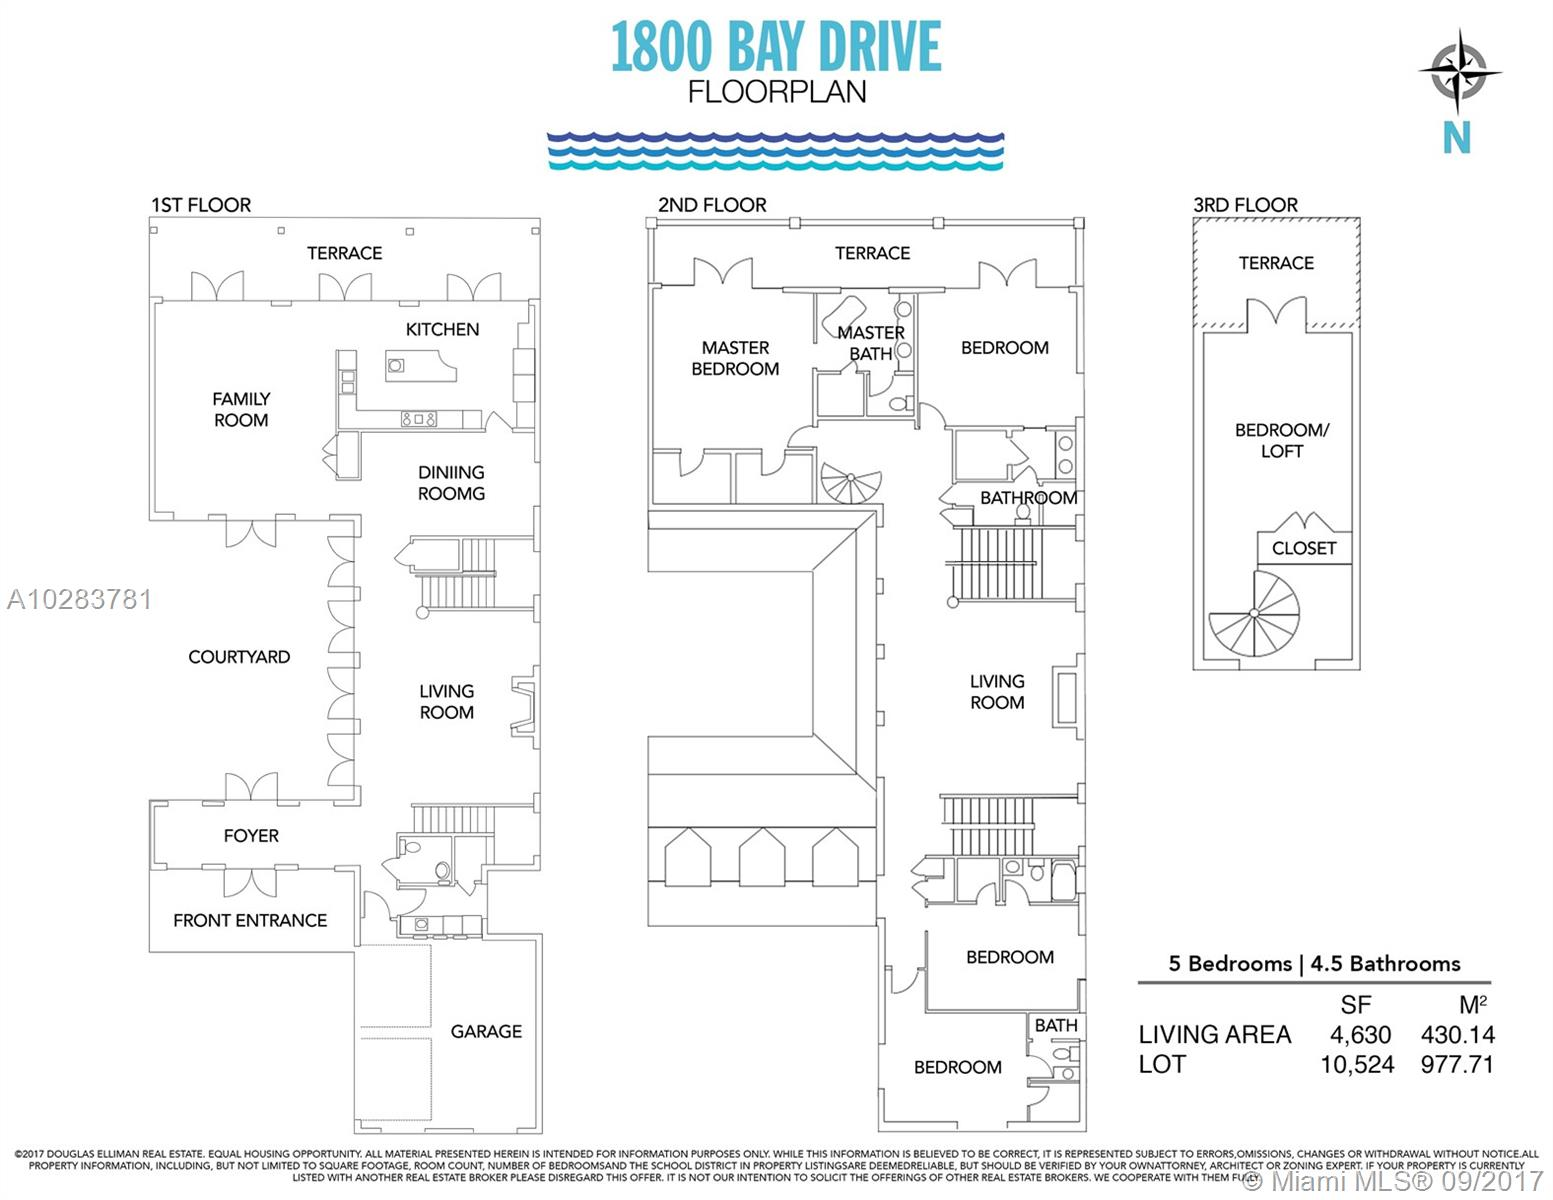 North Miami Beach Property Tax Bill